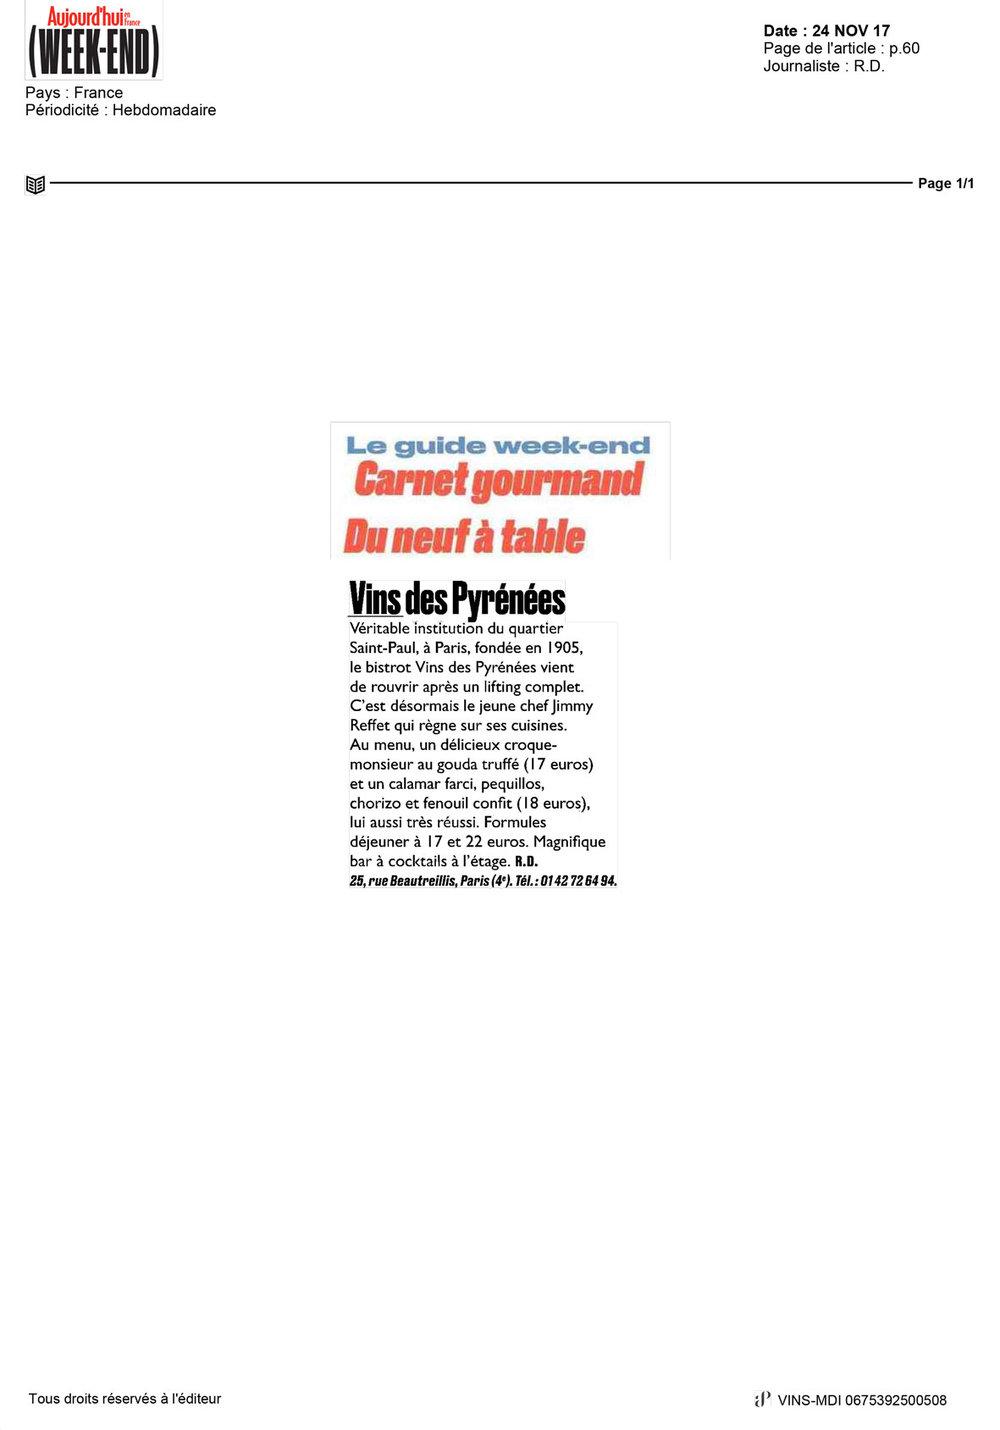 24-11-2017-Aujourdhui-en-France.jpg